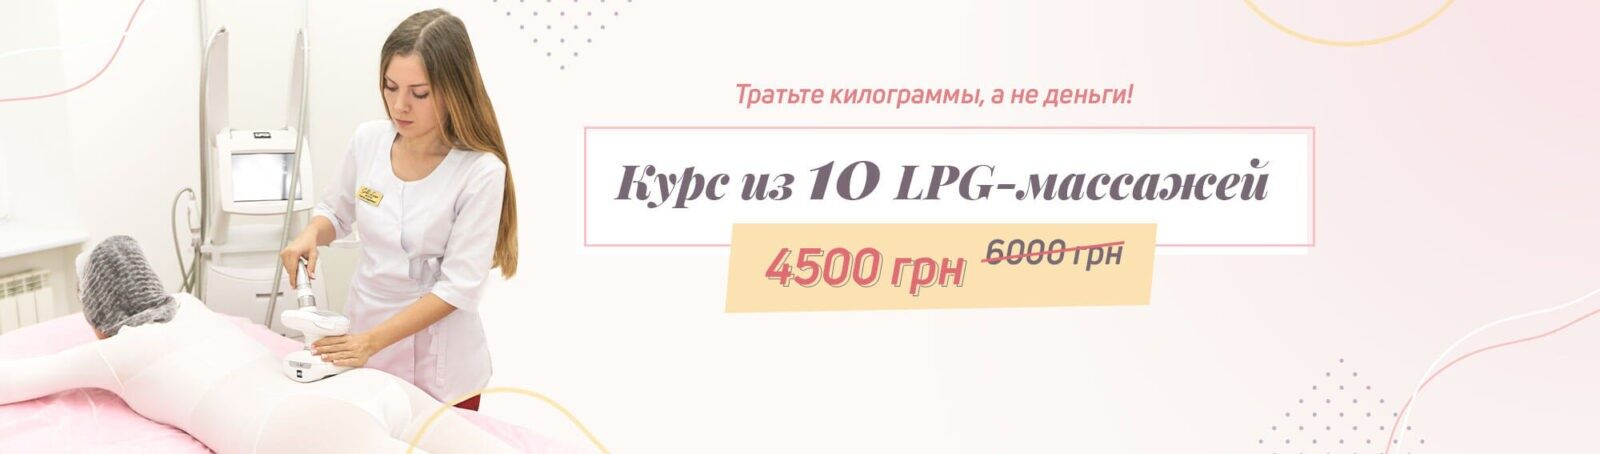 Слайдер ЛПЖ